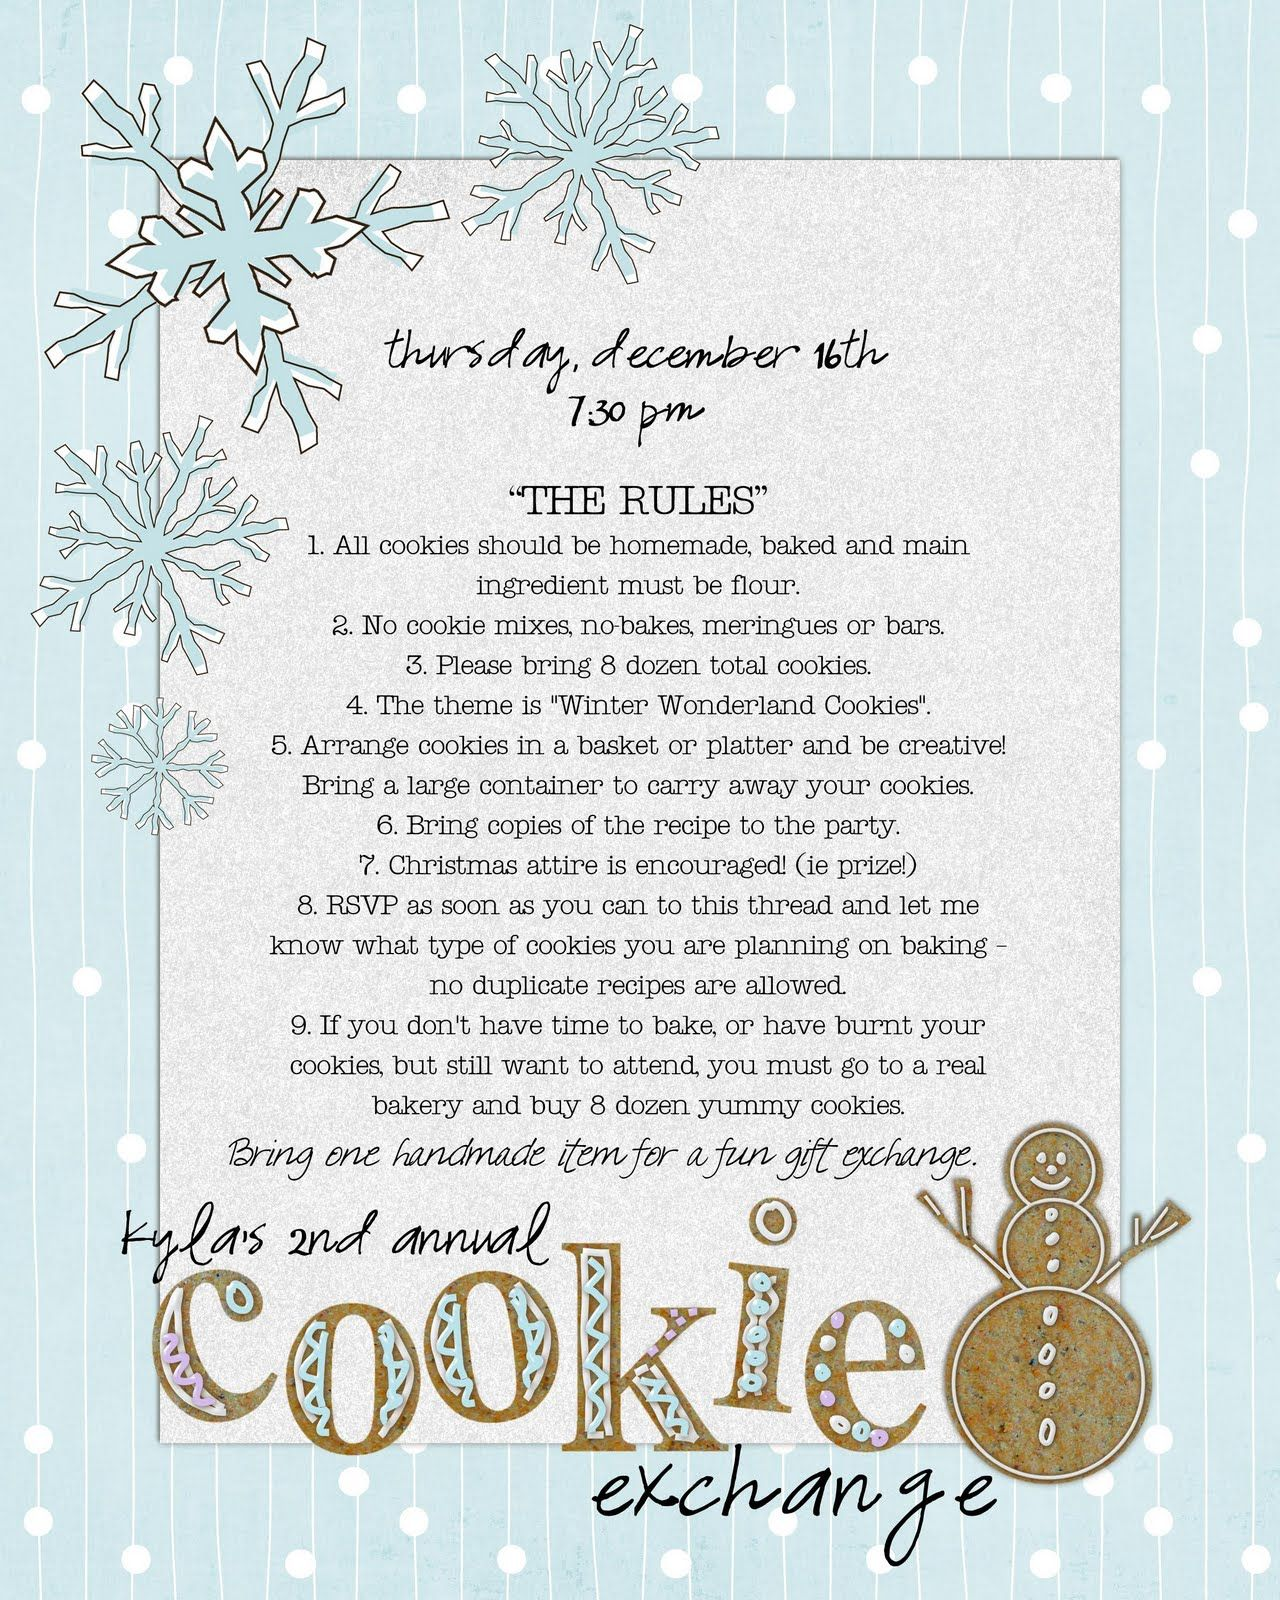 Cookie Exchange Invite | Christmas Cookie Exchange | Pinterest ...